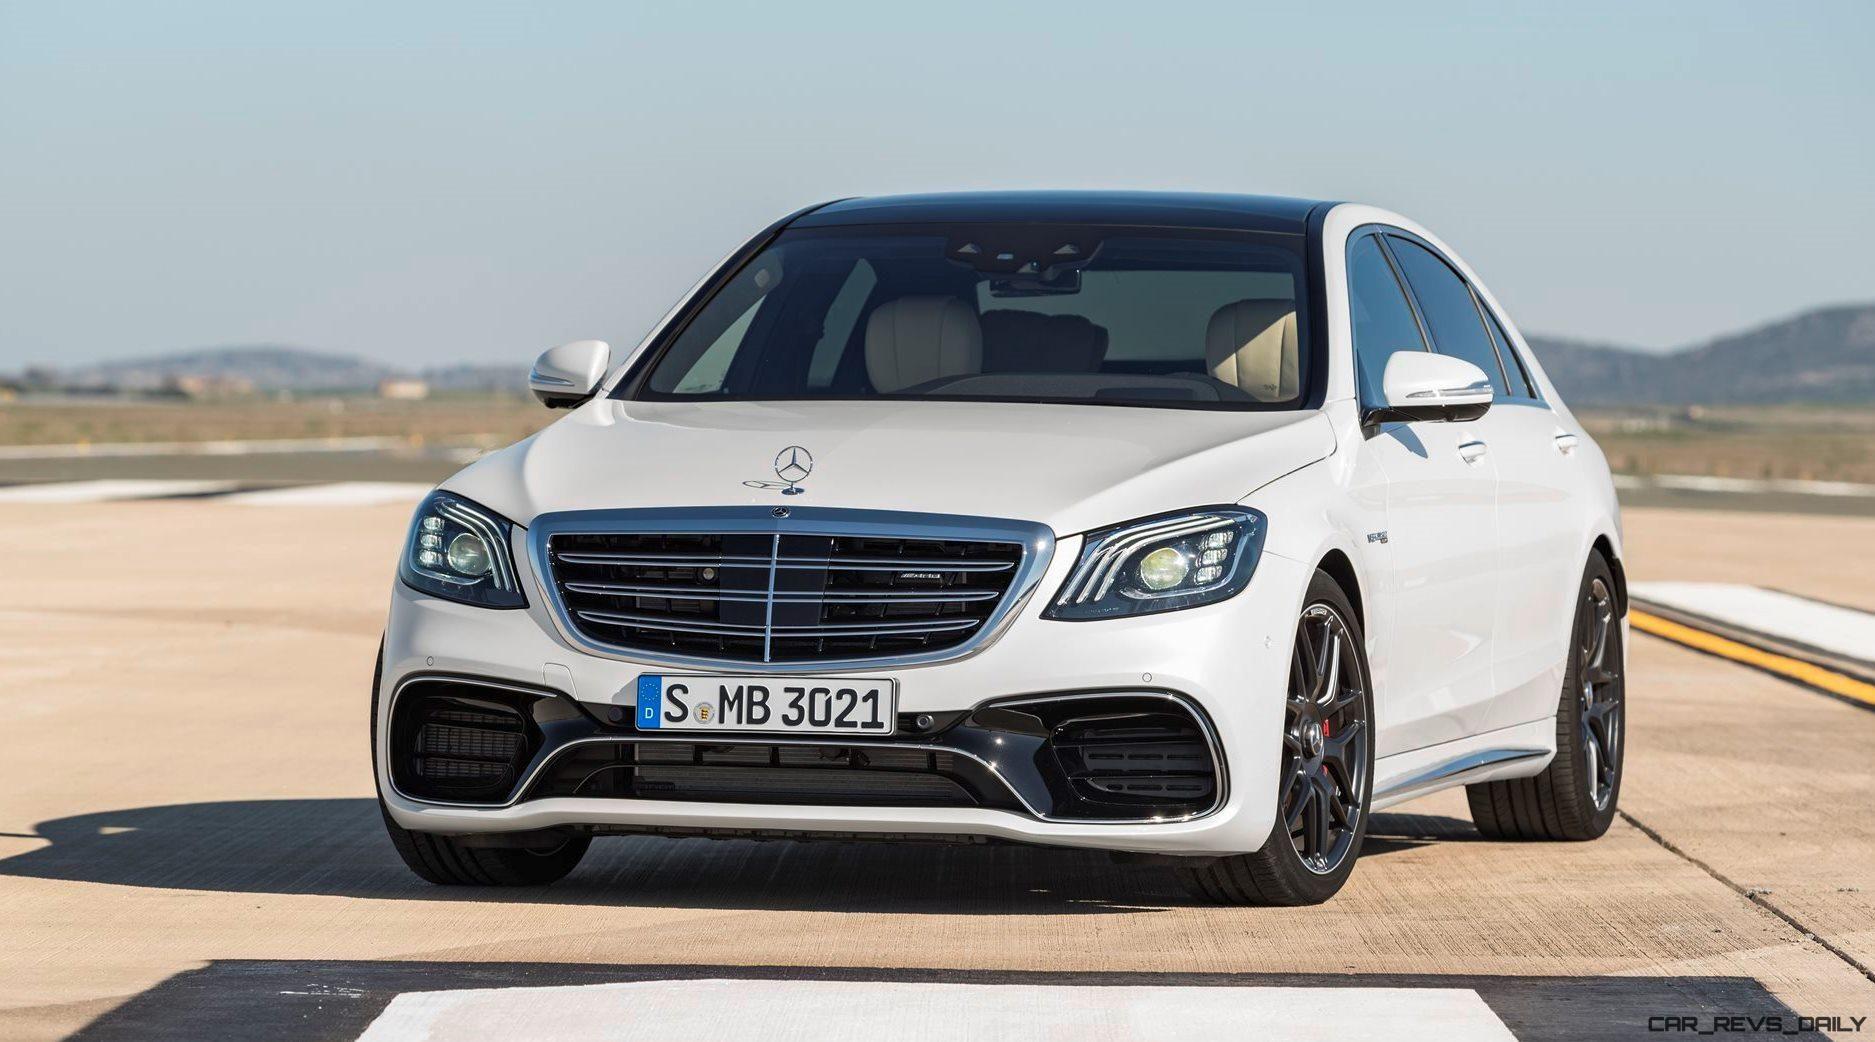 3 4s 186mph 2018 Mercedes Amg S63 Scores Full Drivetrain Makeover Car Shopping Car Revs Daily Com New Mercedes Amg Mercedes S Class Coupe Benz S Class